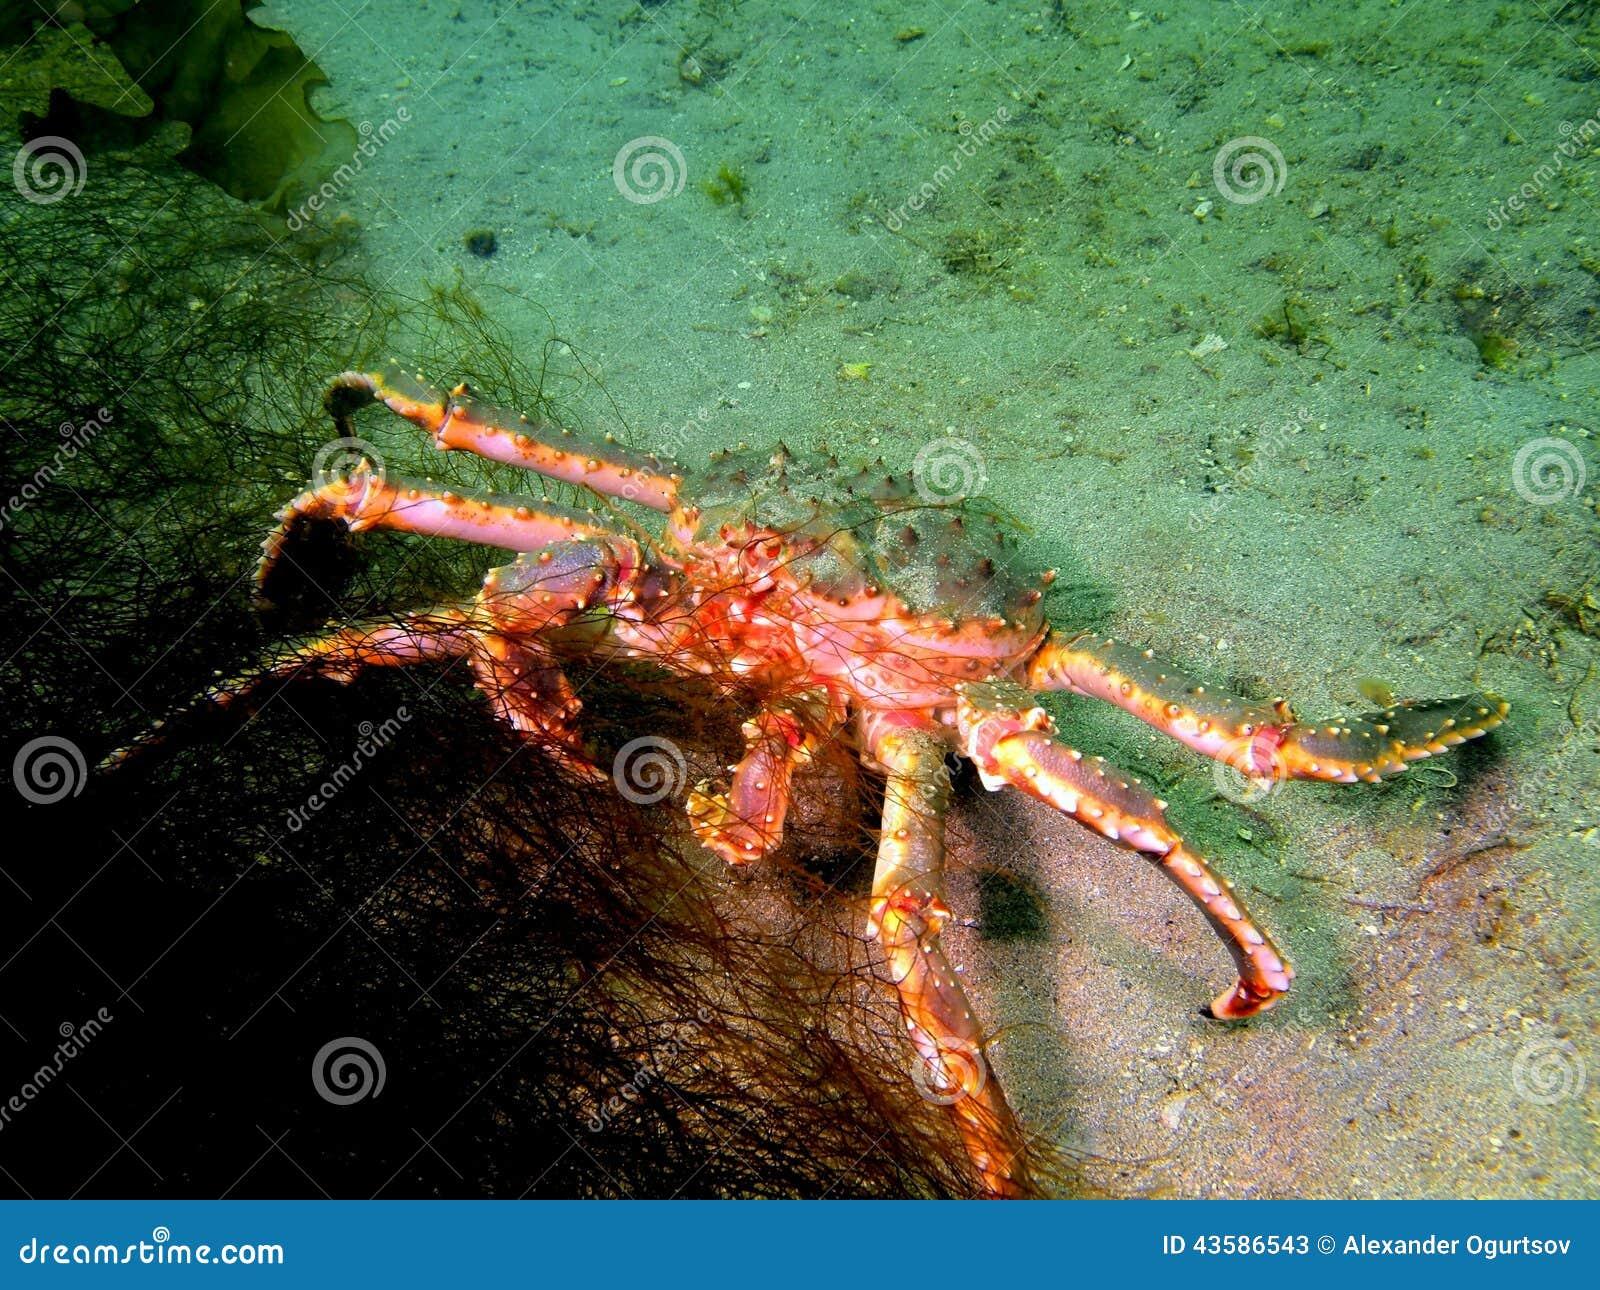 King crab underwater